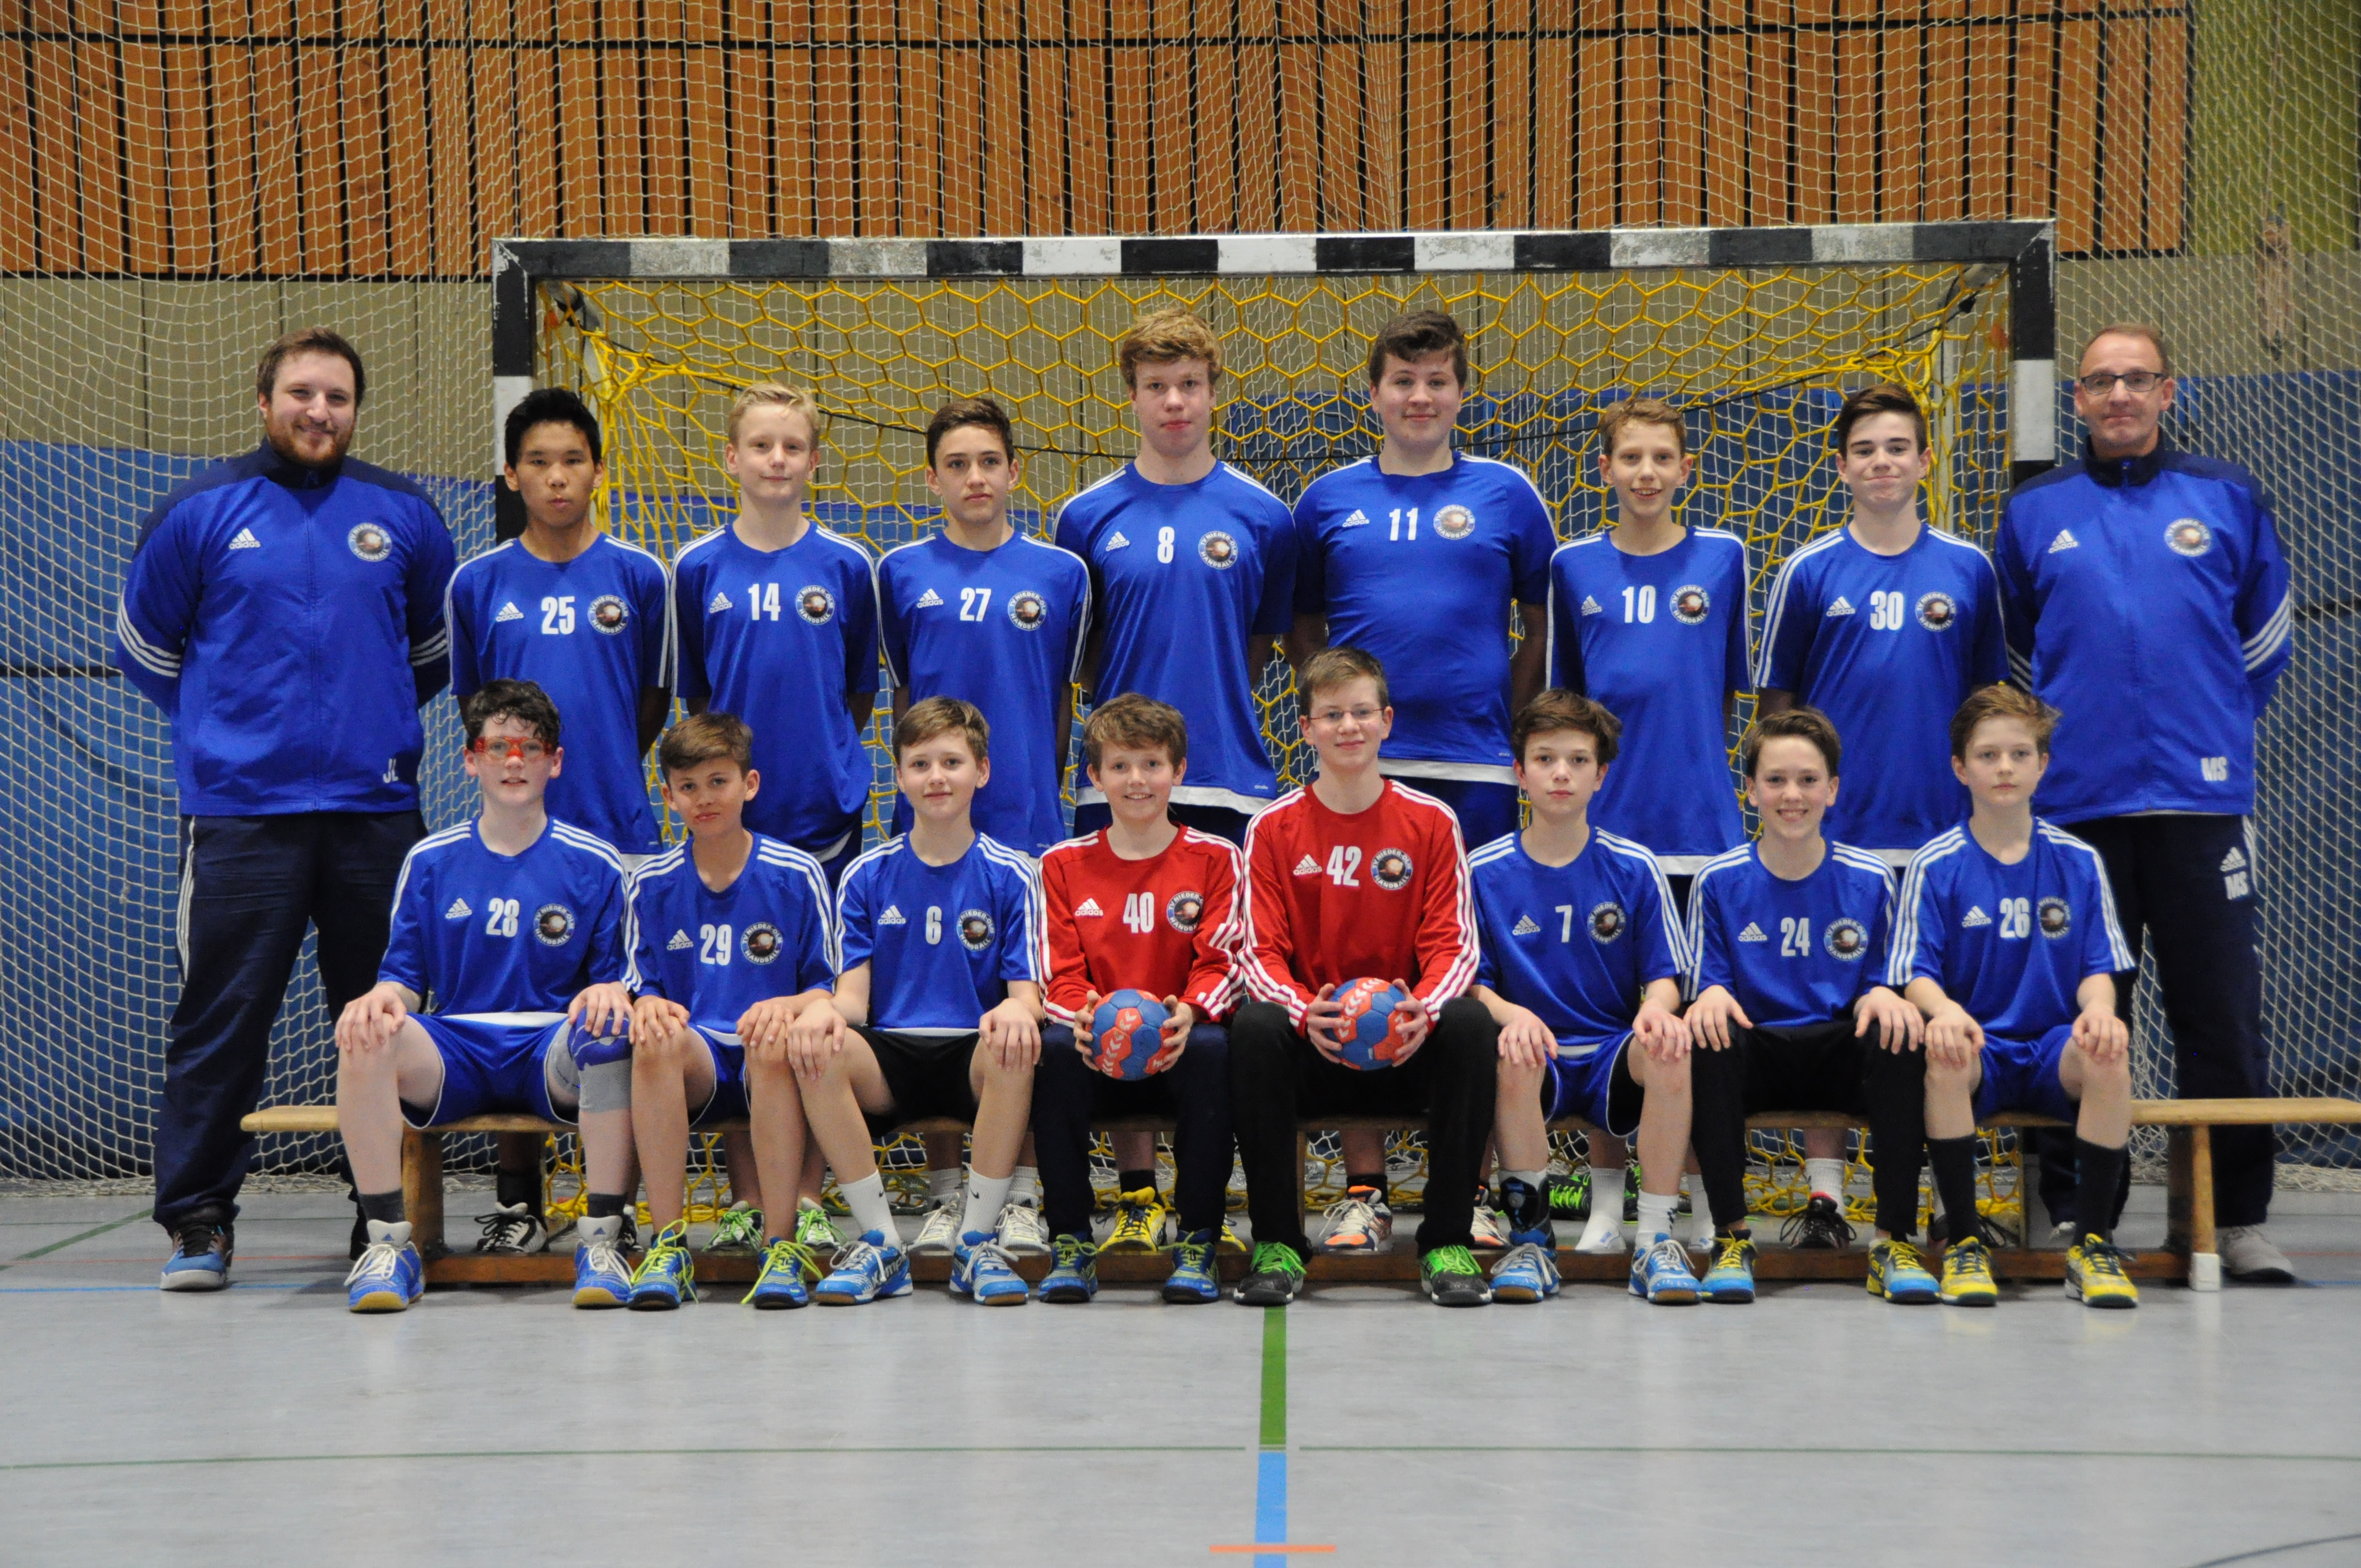 C-Jugend souverän in Hauptrunde zur Oberliga-Quali